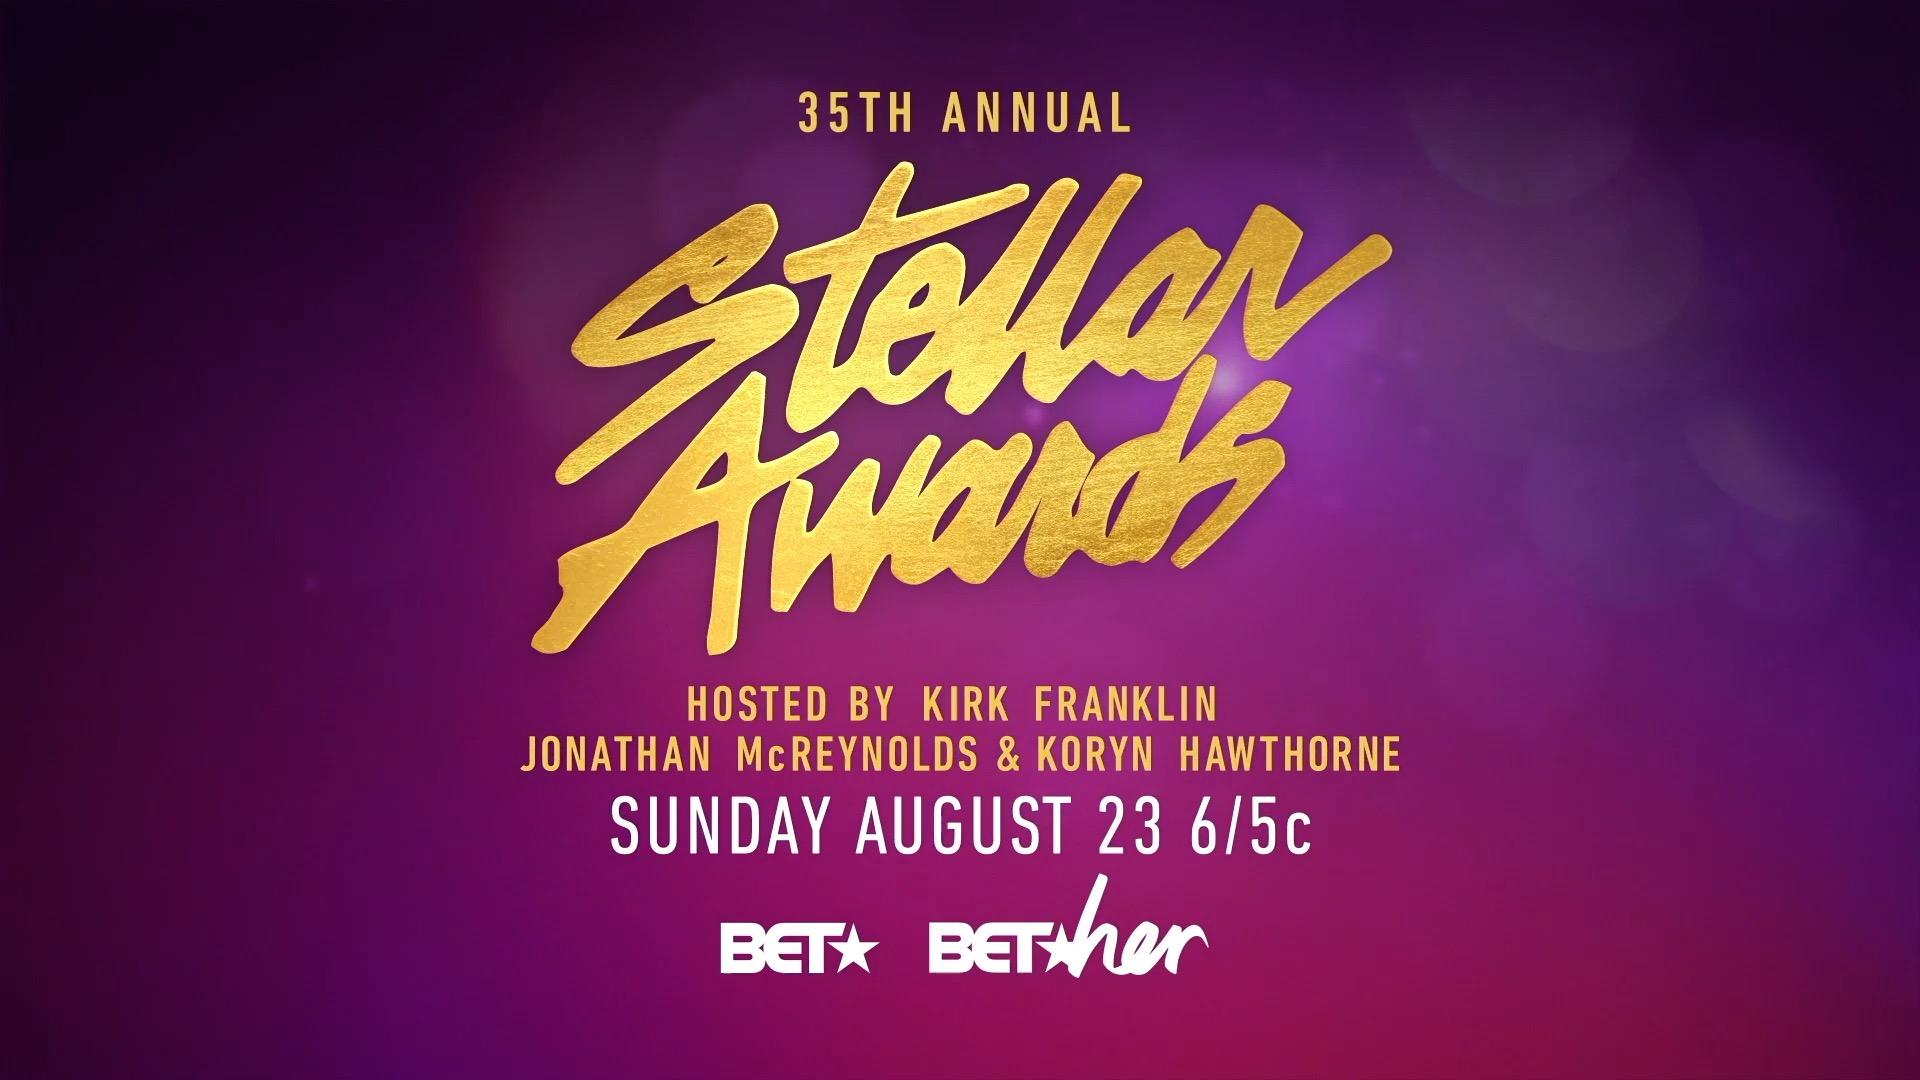 stellar awards las vegas 2021 presidential betting